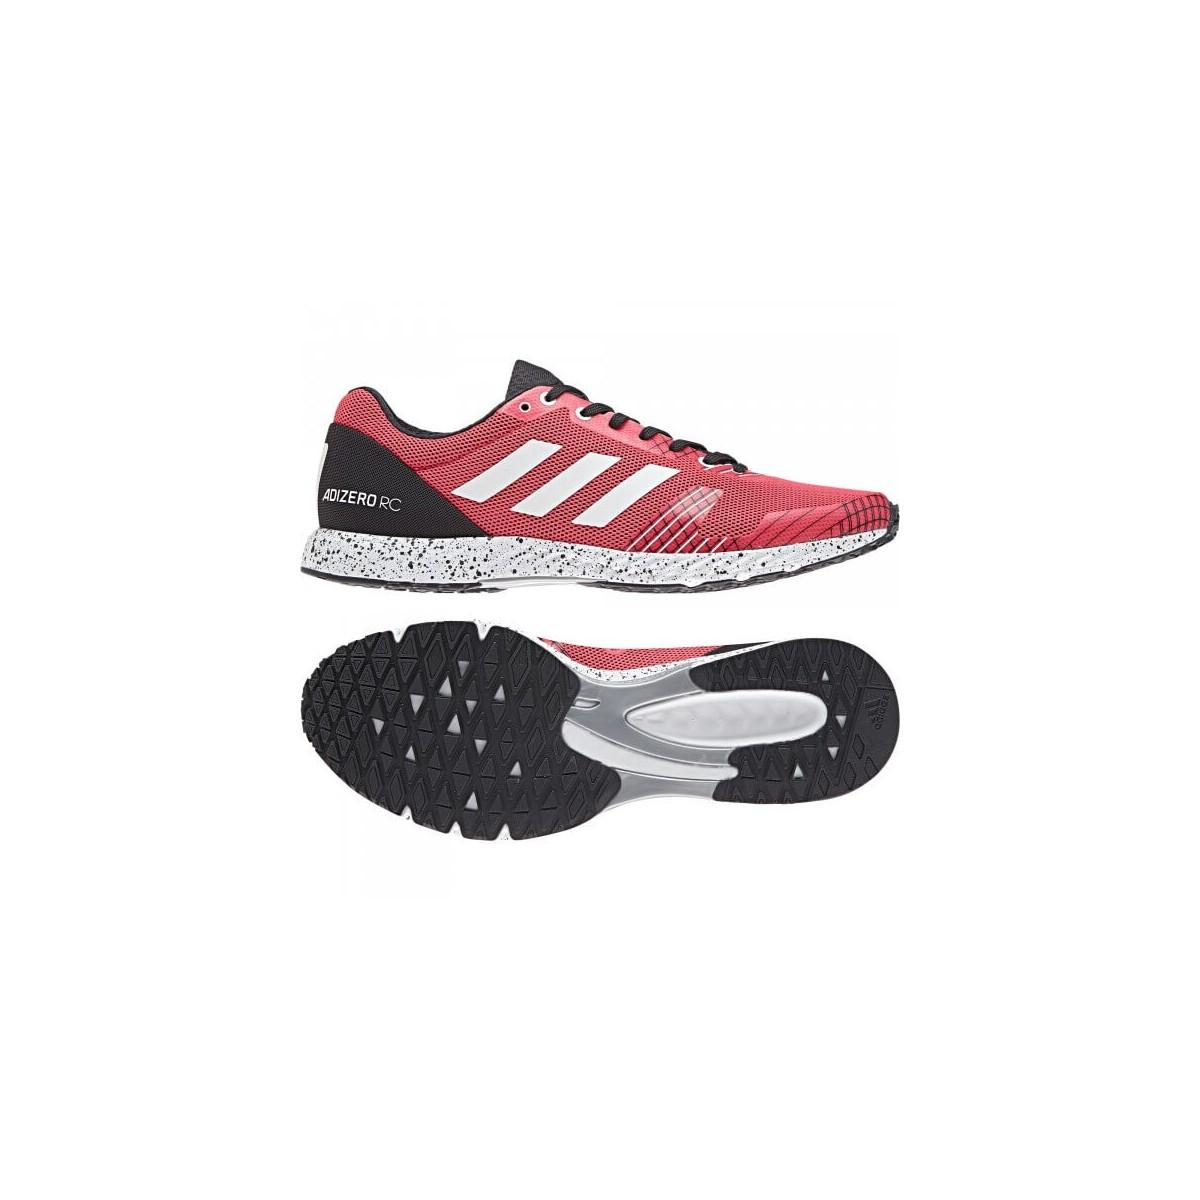 Negro Hombre Rojo Adizero Rc Pv19 Adidas mO80vnNw